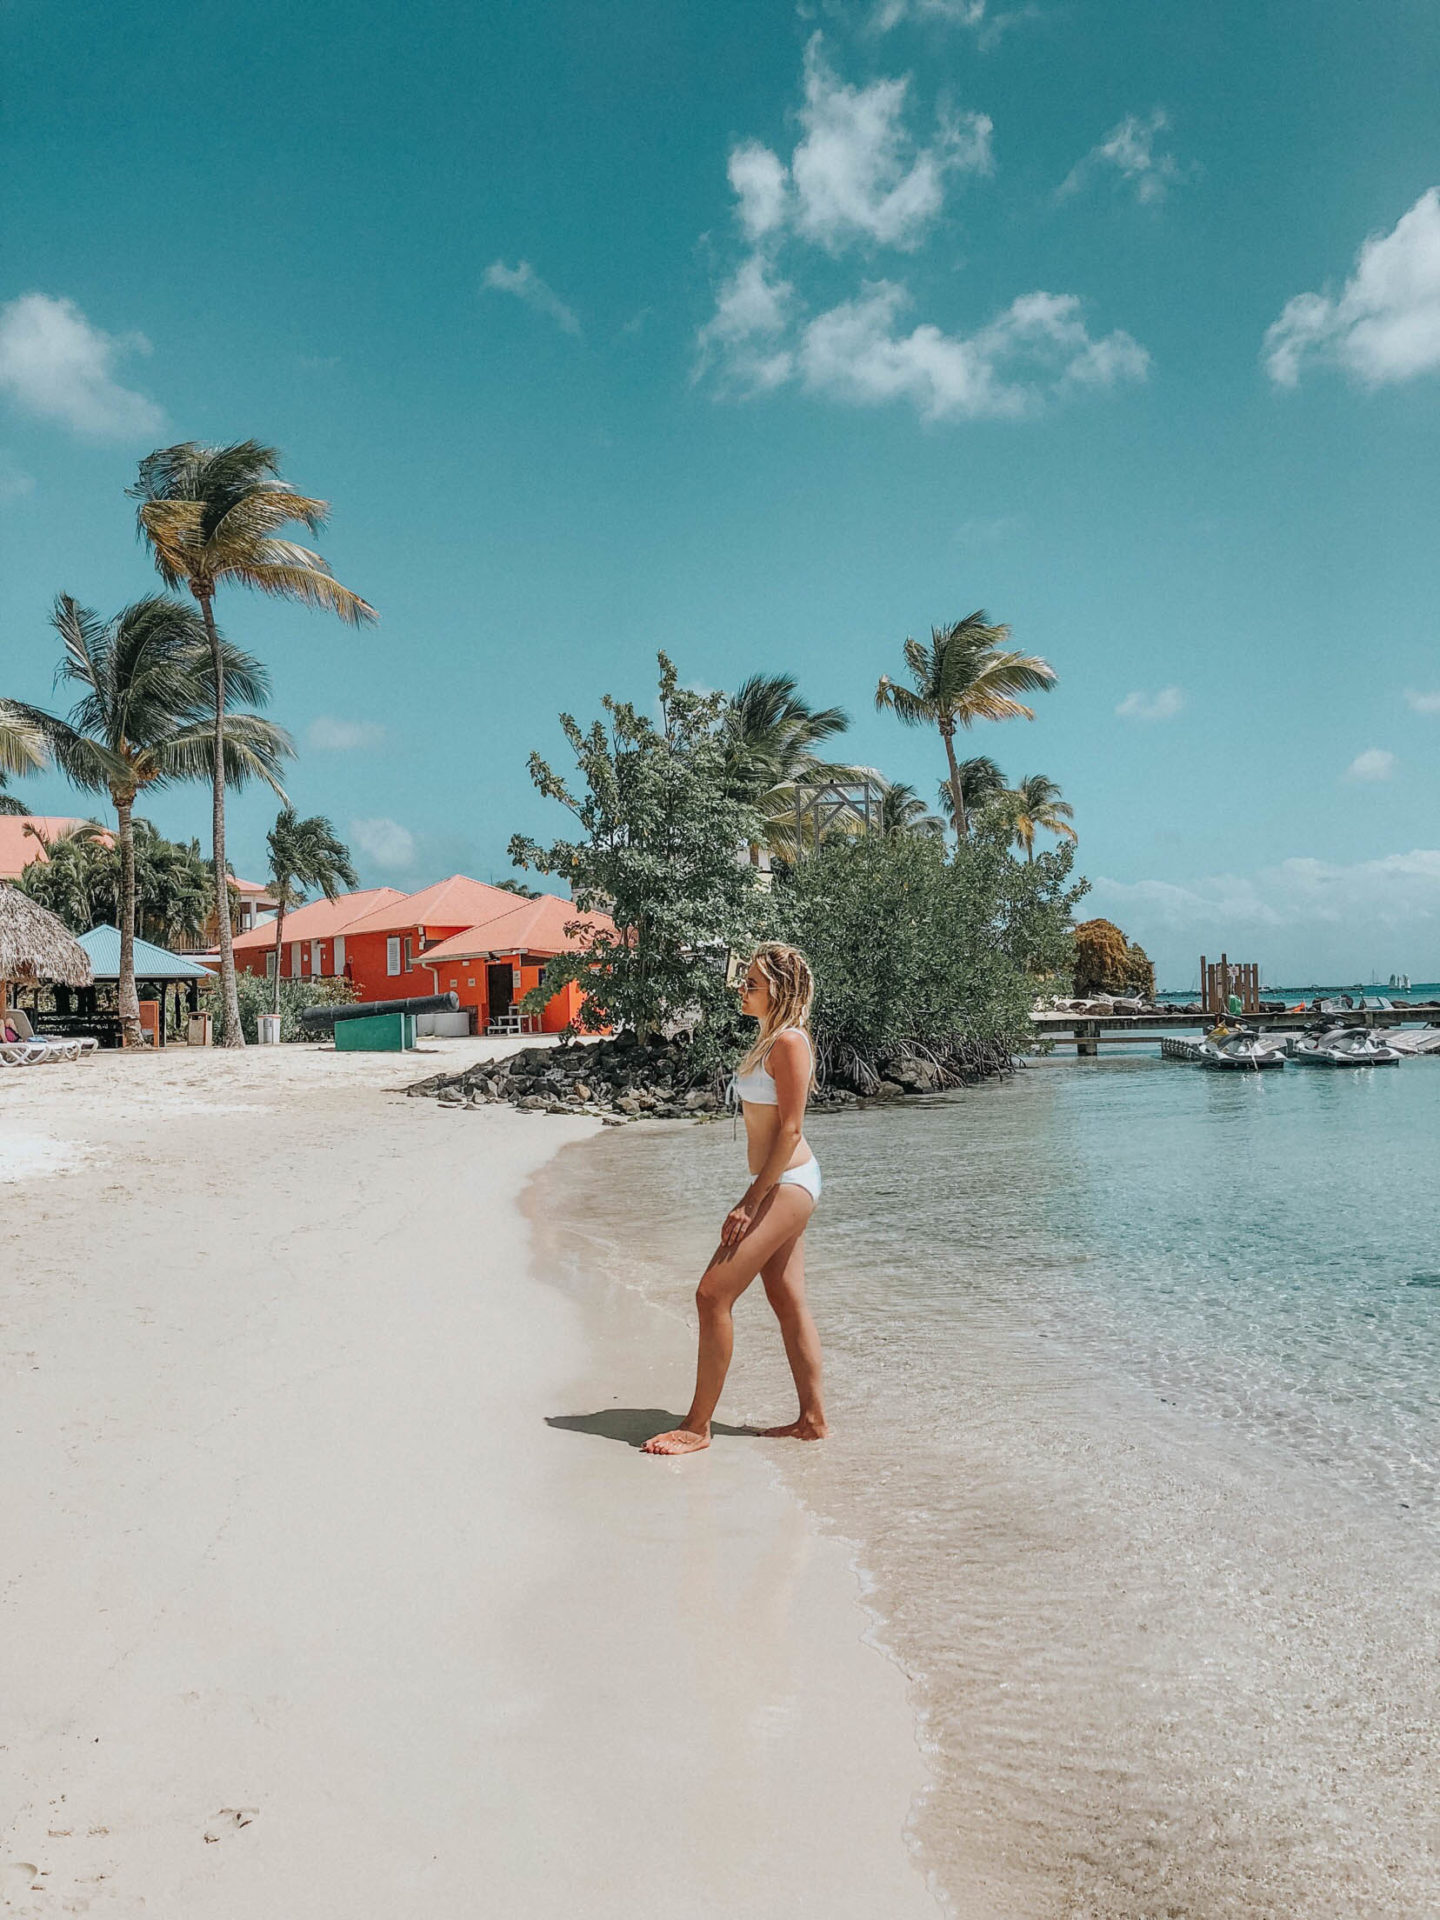 Caraïbes - Blondie Baby blog mode Paris et voyages